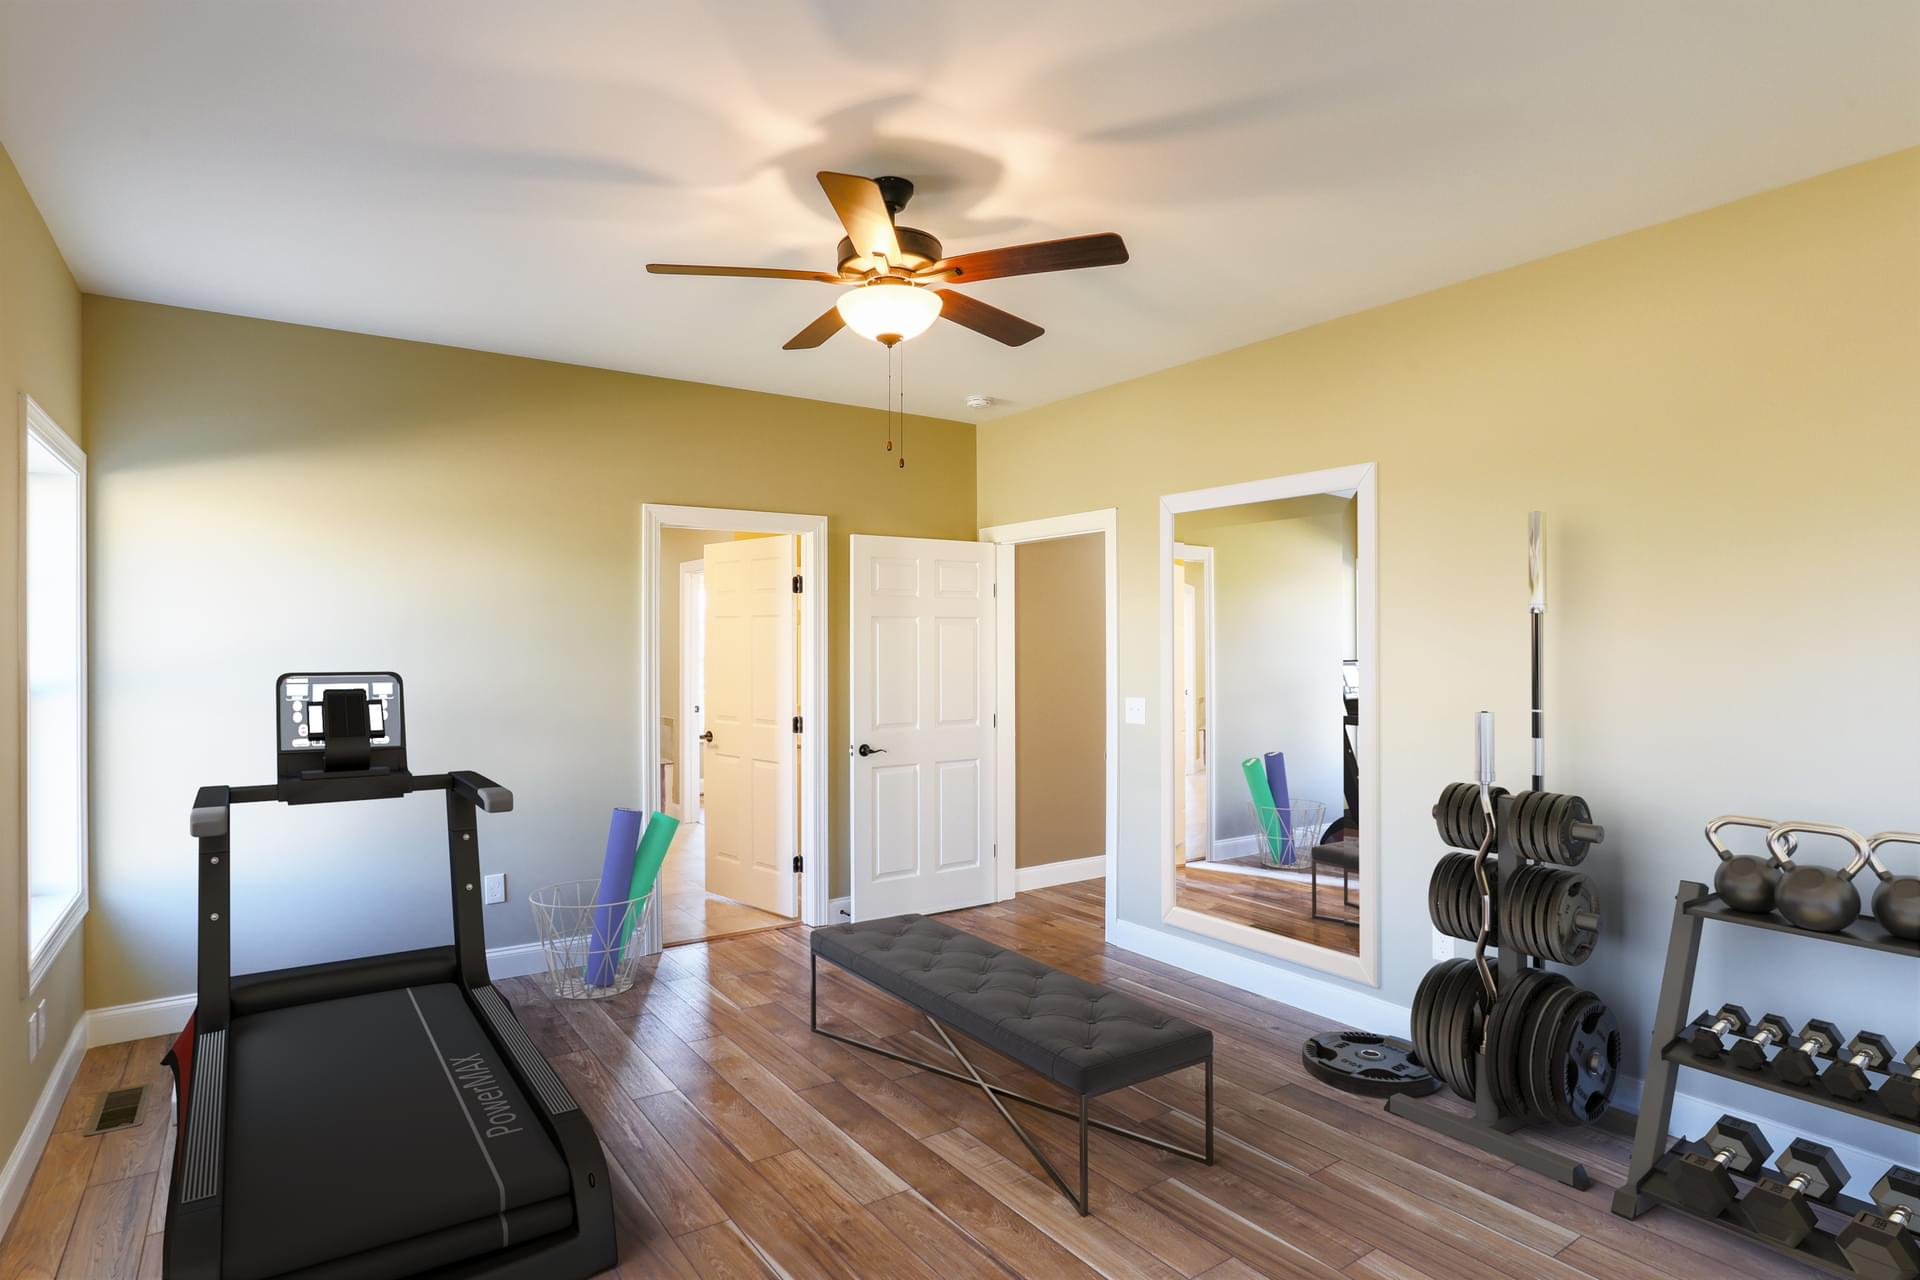 How to Create a Home Gym